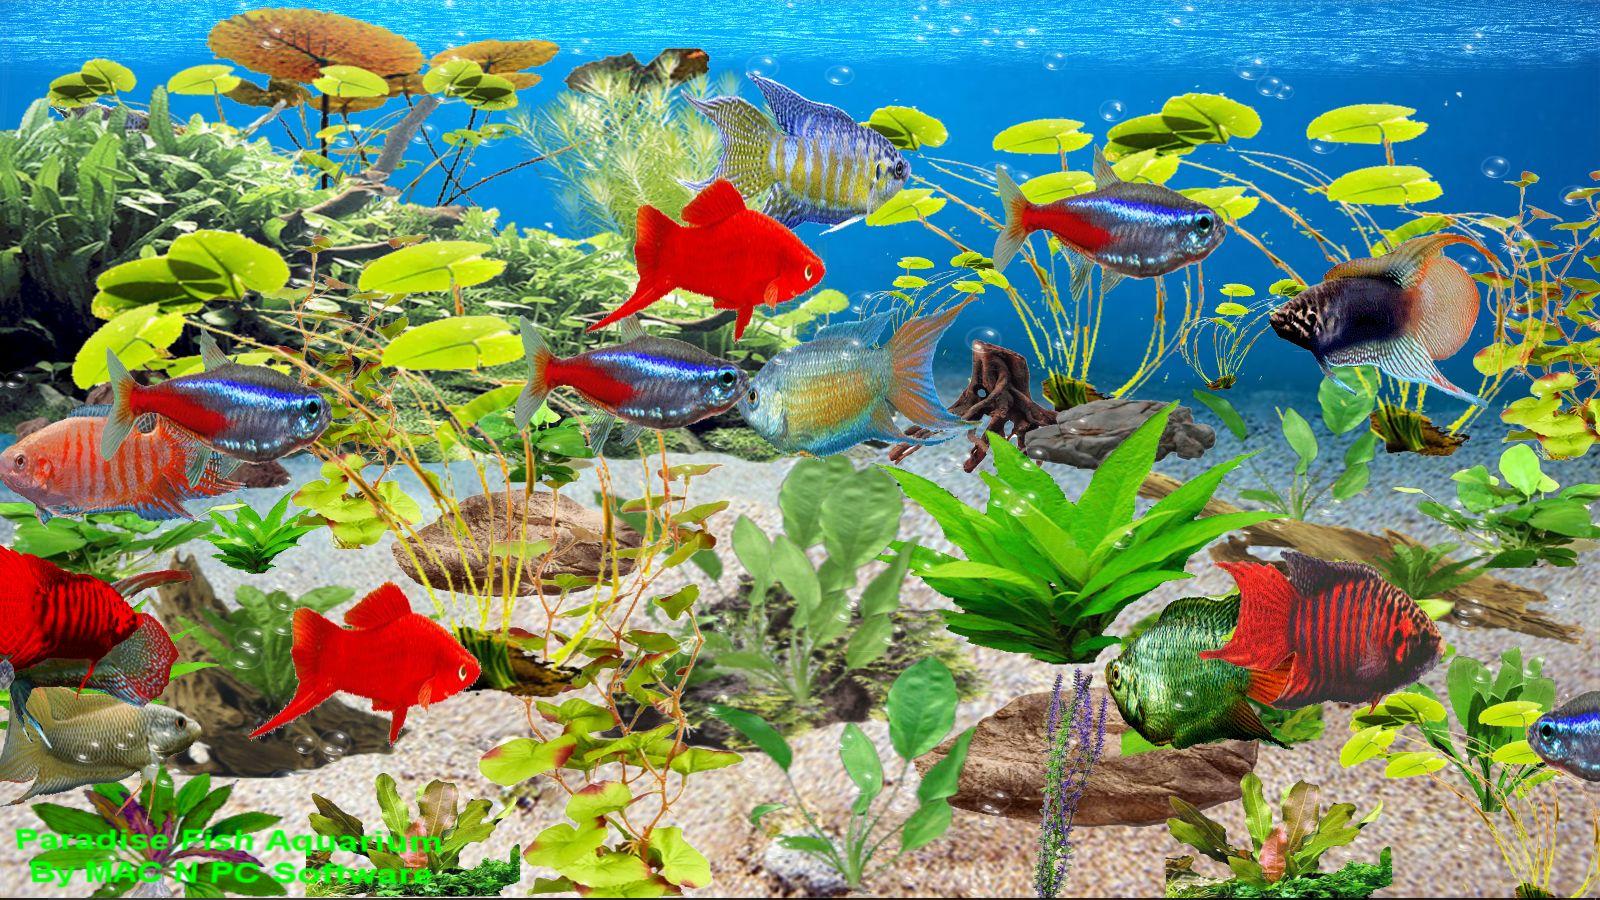 Download aquarium filme kostenlos